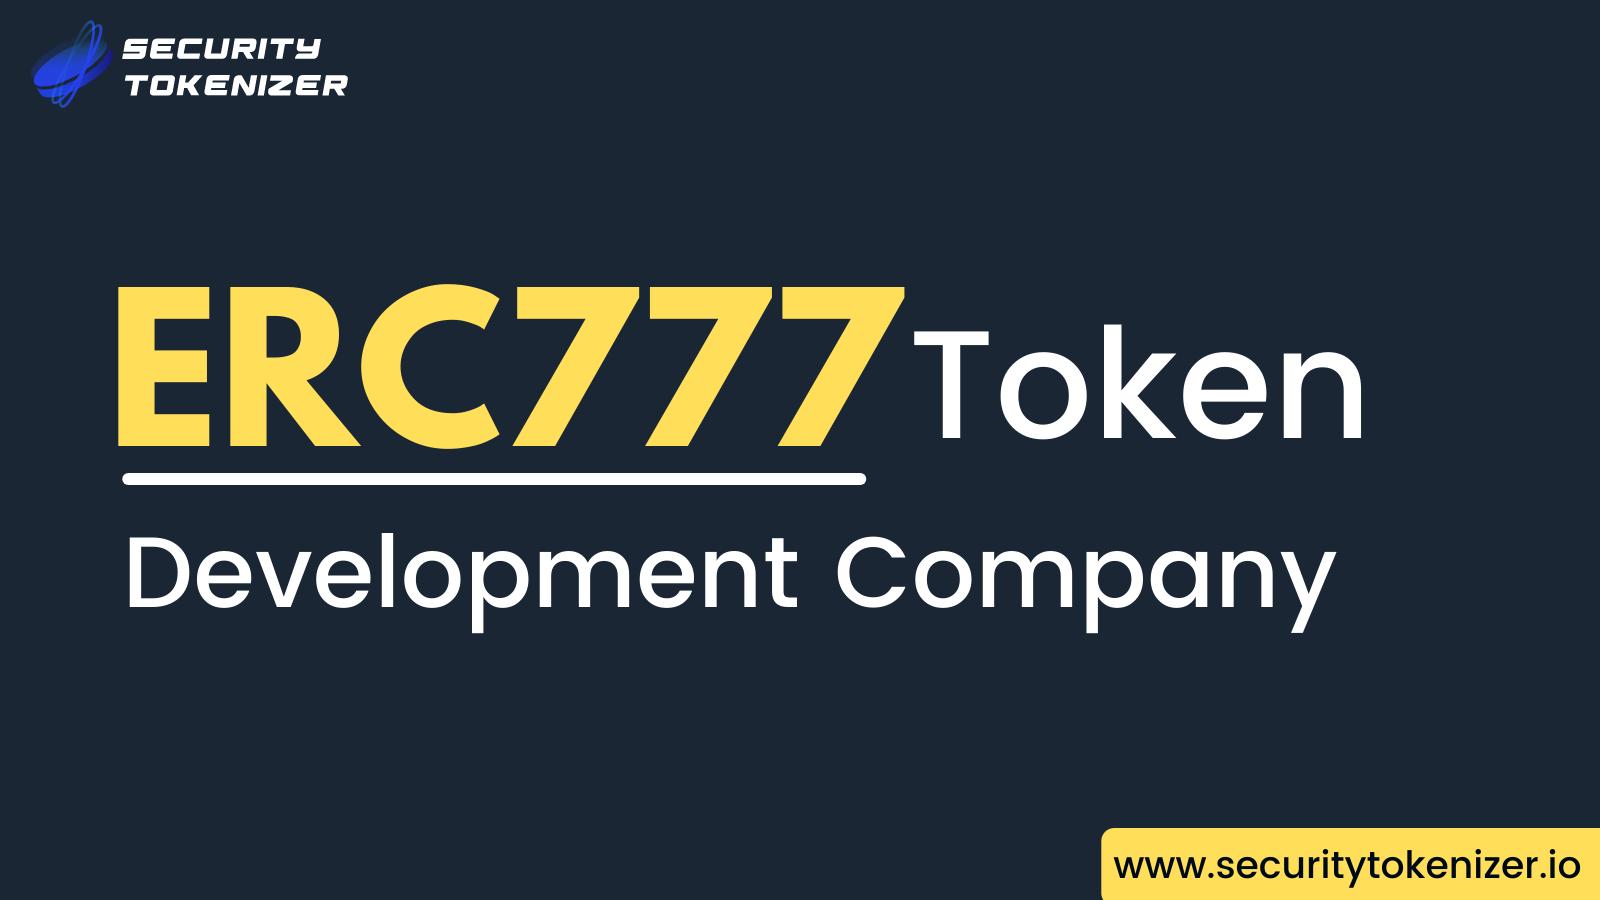 ERC777 Token Development Company